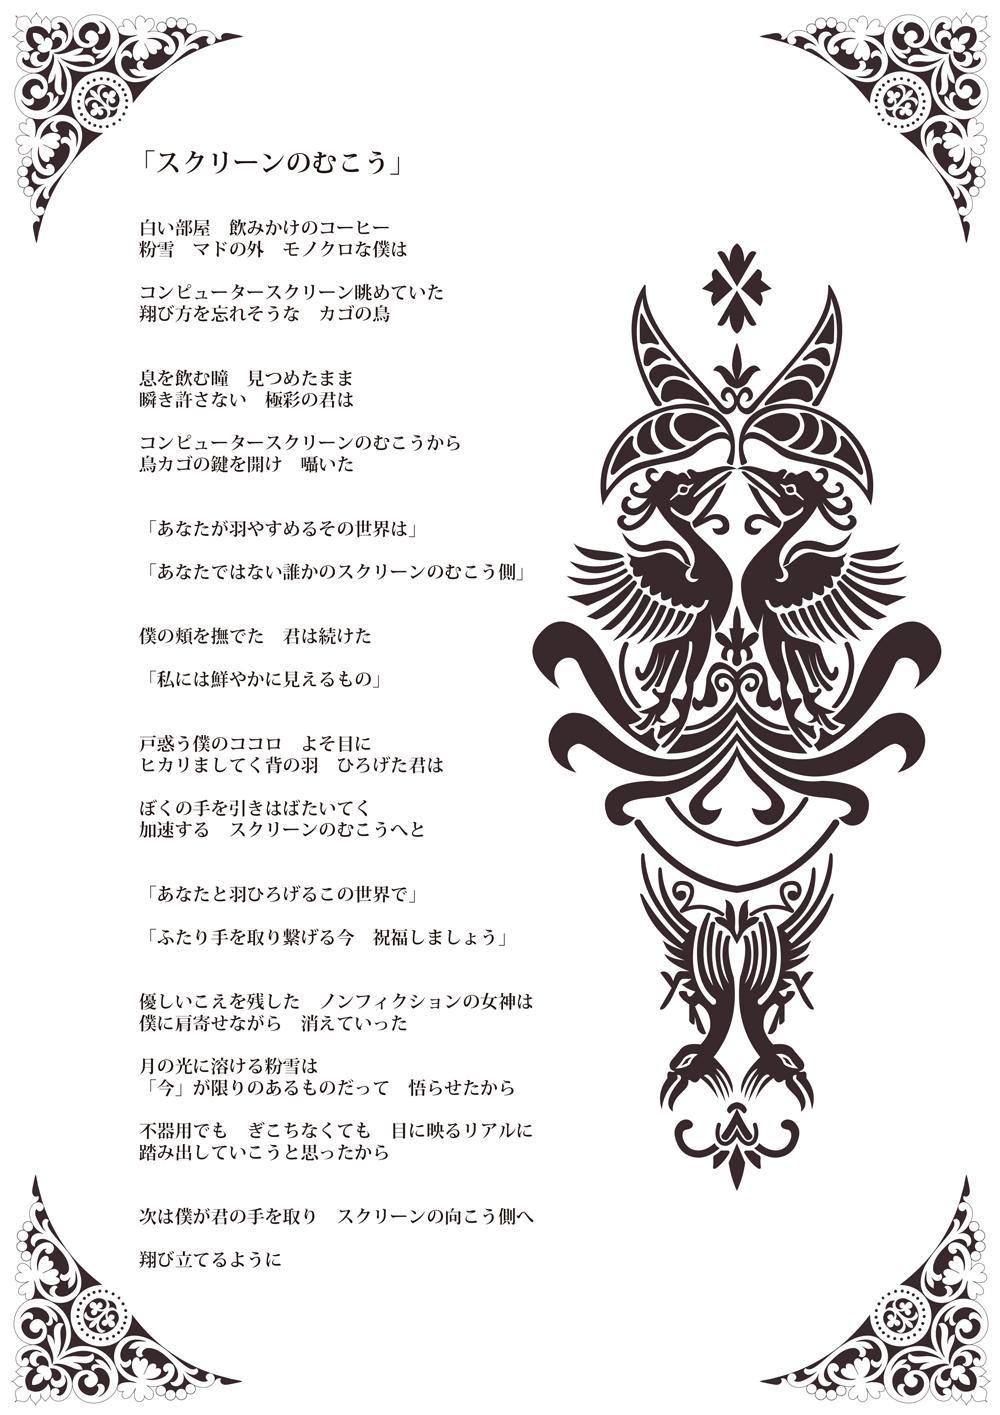 http://af0001.xsrv.jp/screennomukou.jpg